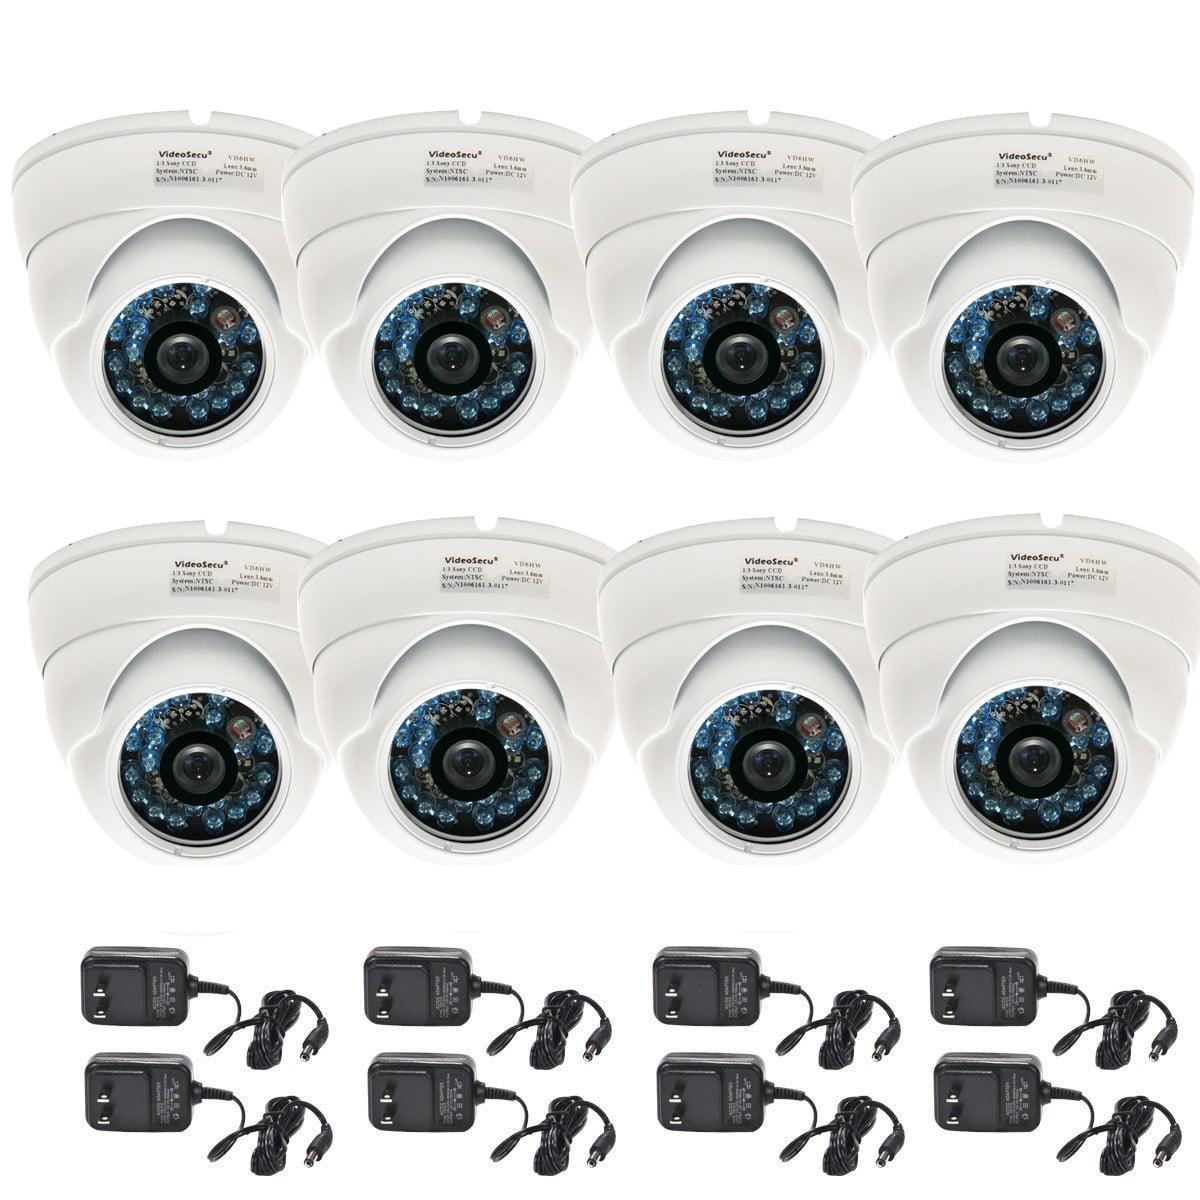 VideoSecu 8x Outdoor Security Camera IR Night Vision Buil...